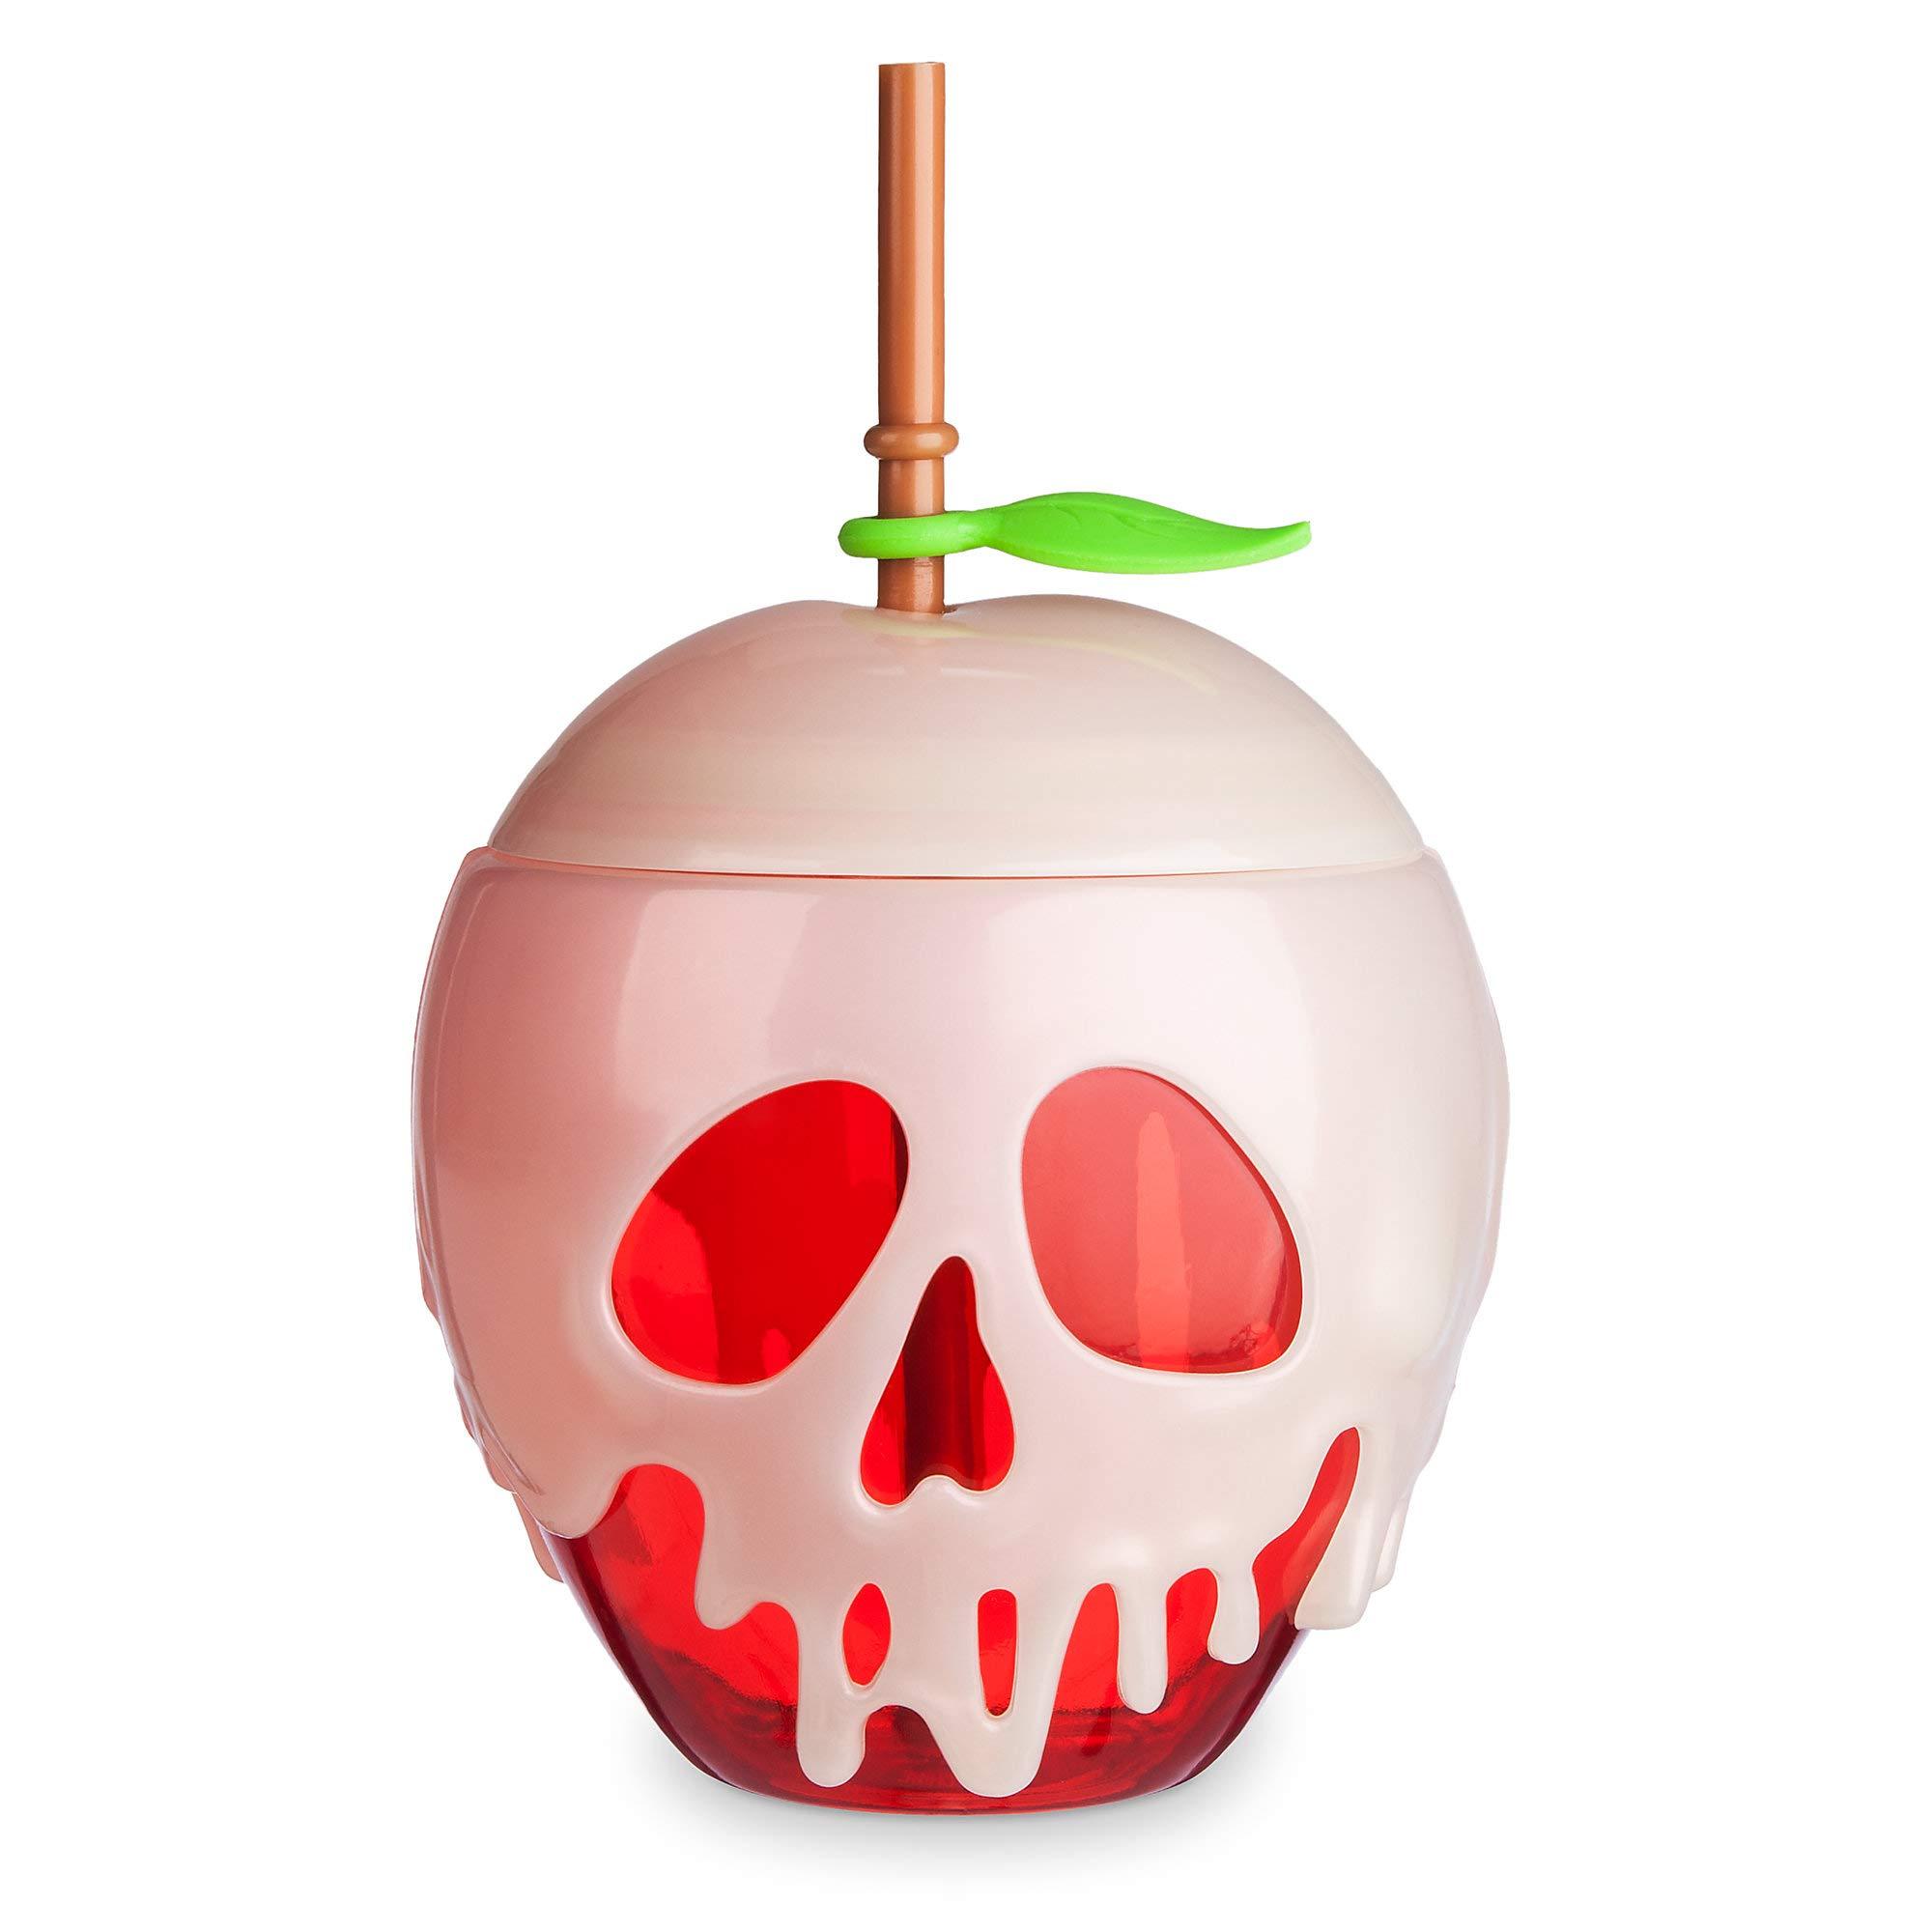 Disney Snow White Poisoned Apple Tumbler with Straw - Oh My Disney MUTLI by Disney